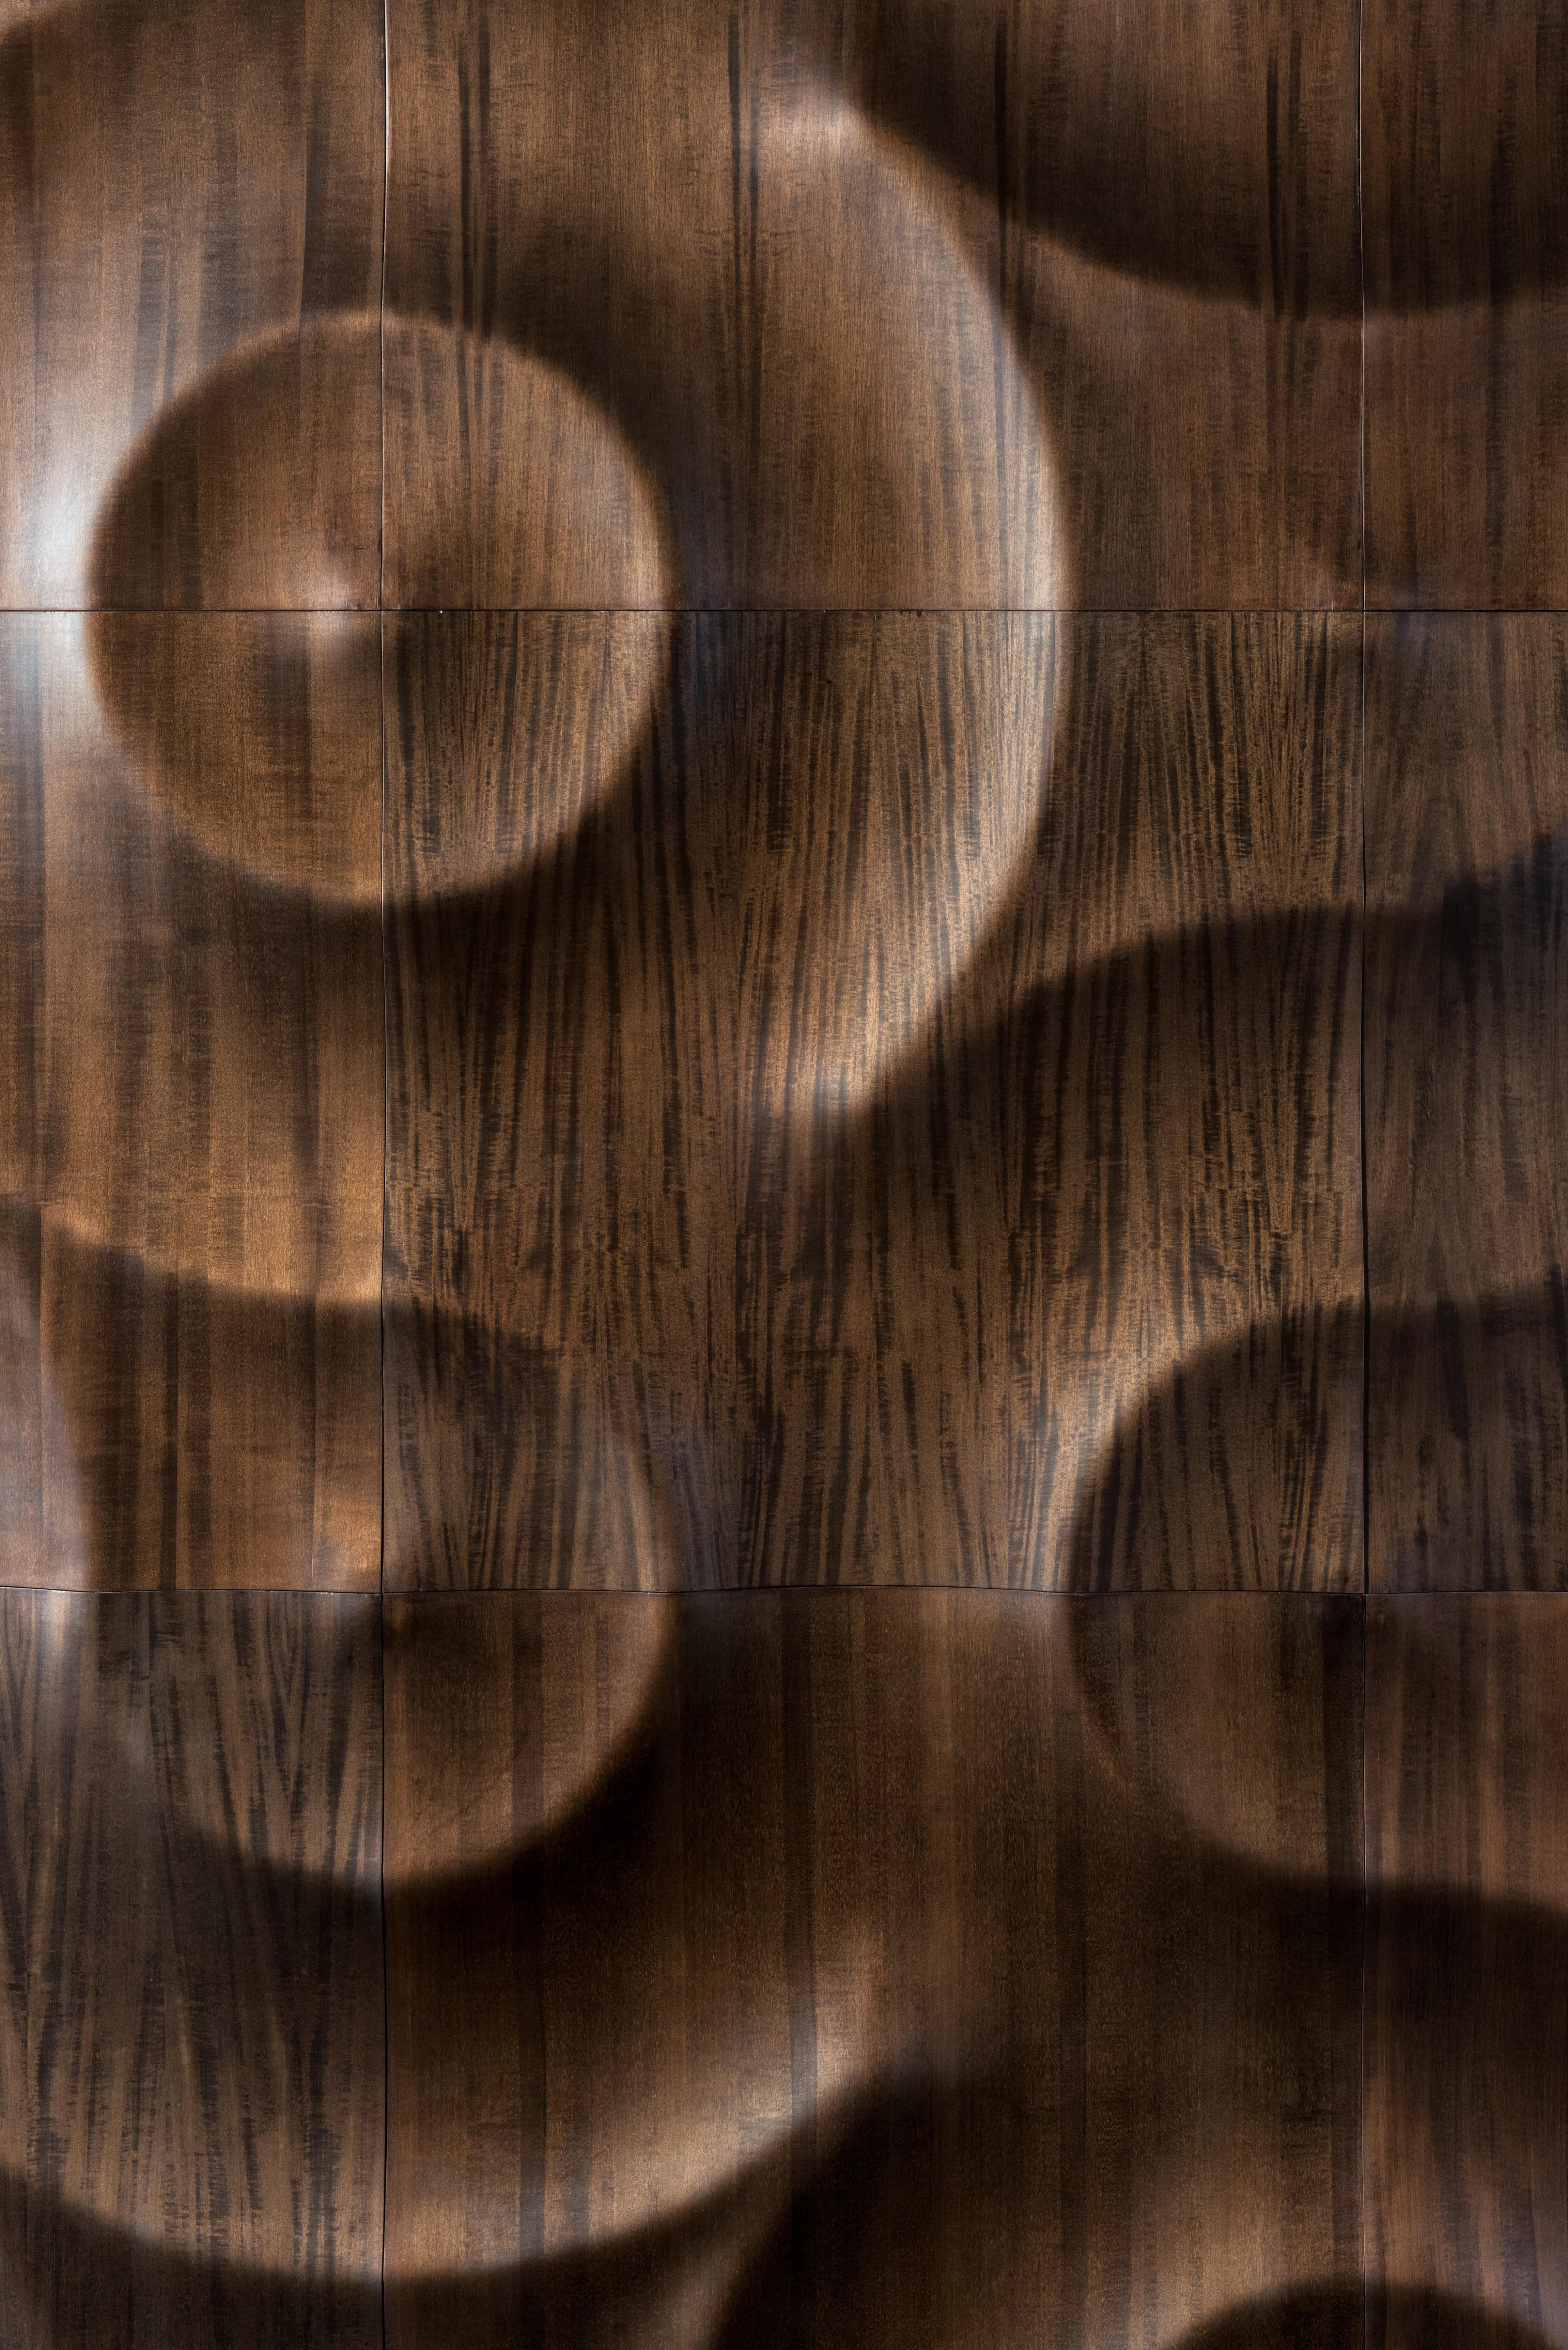 3D Multi Layer Wall Covering Of Real Wooden Veneers #Interiordesign #Interiordesigninspiration